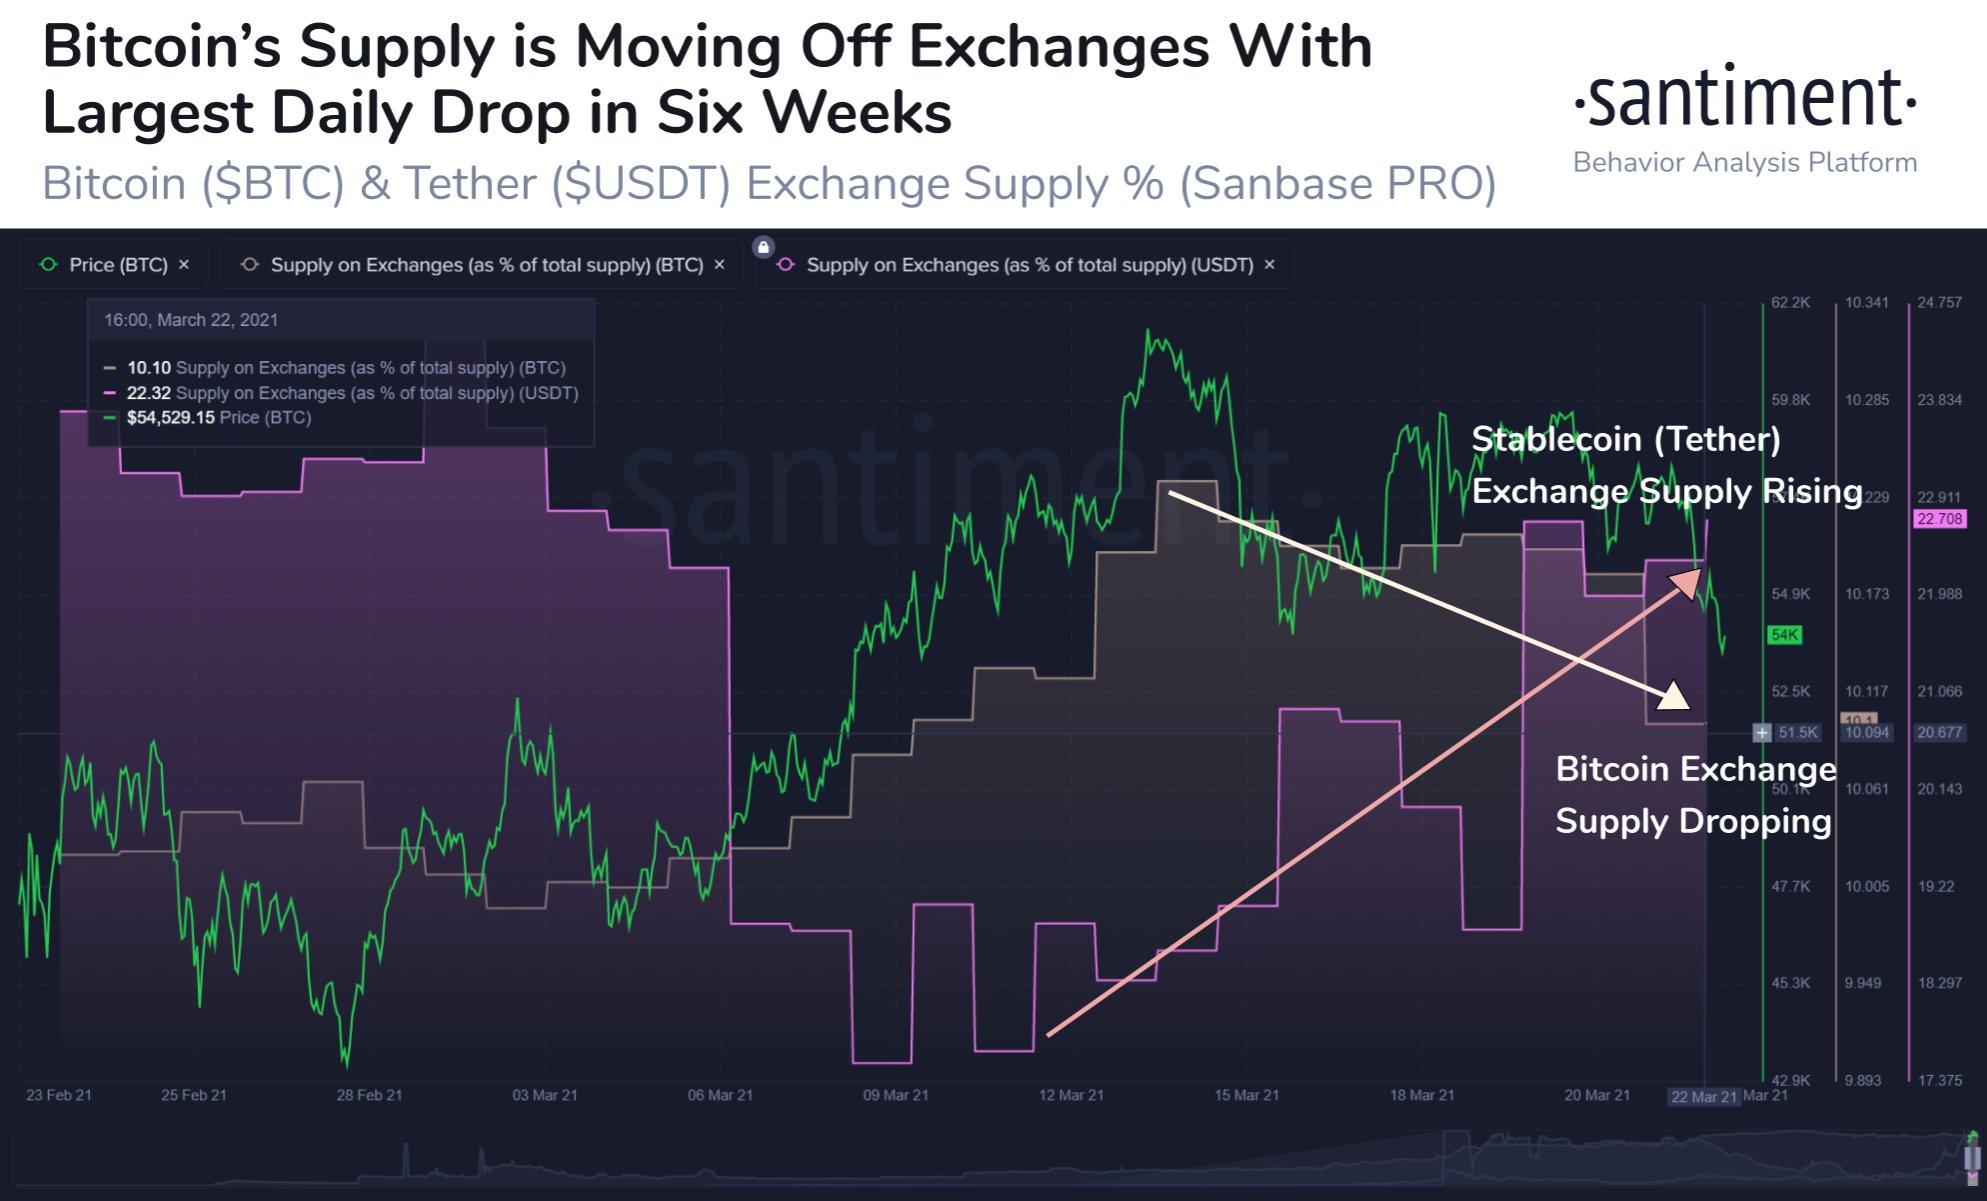 Bitcoin may 'take out' previous $53K lows before bulls regain control, says trader